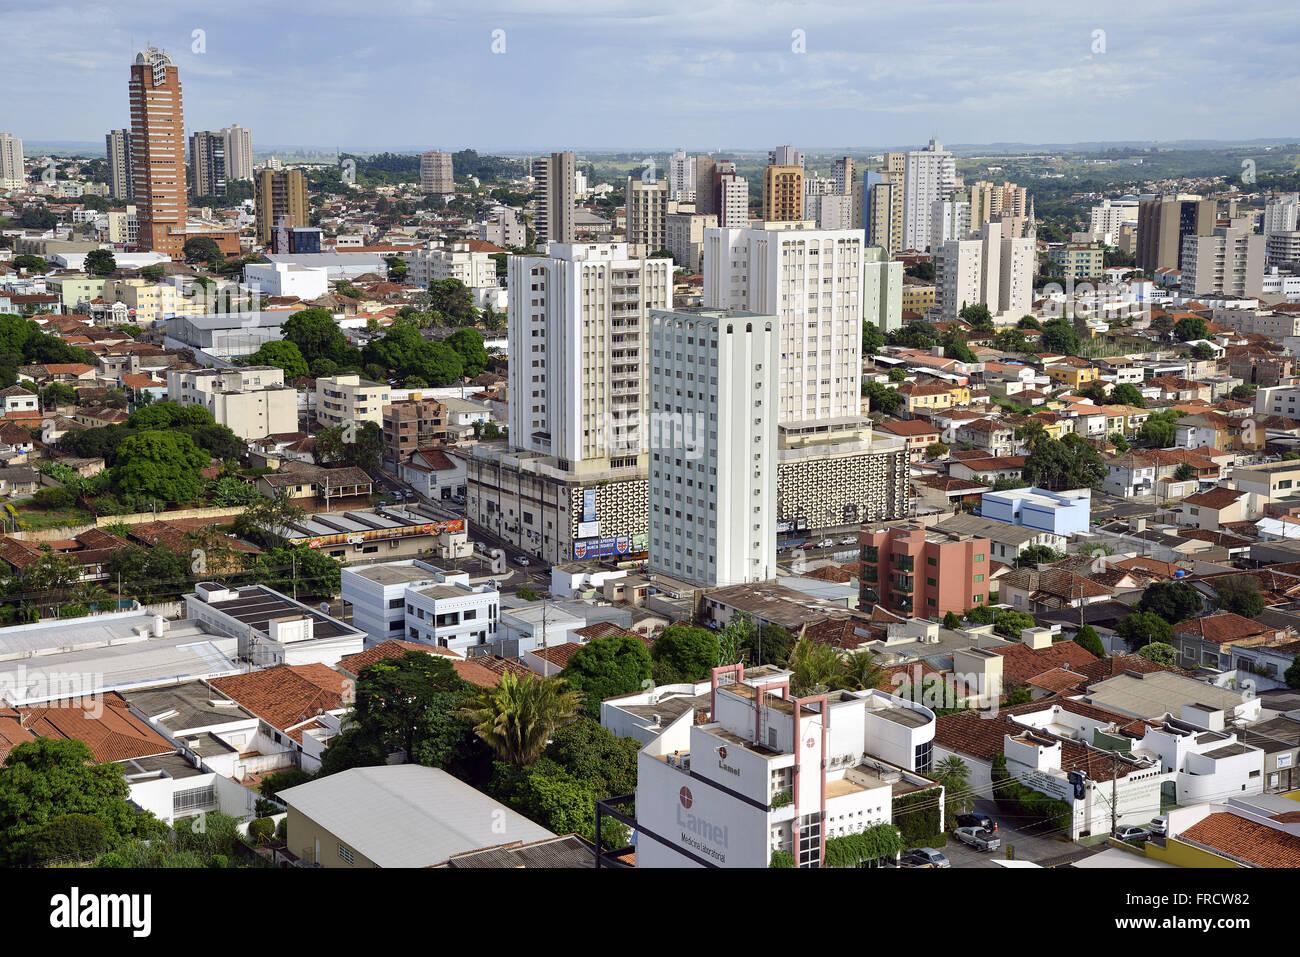 Vista de cima da cidade Stock Photo